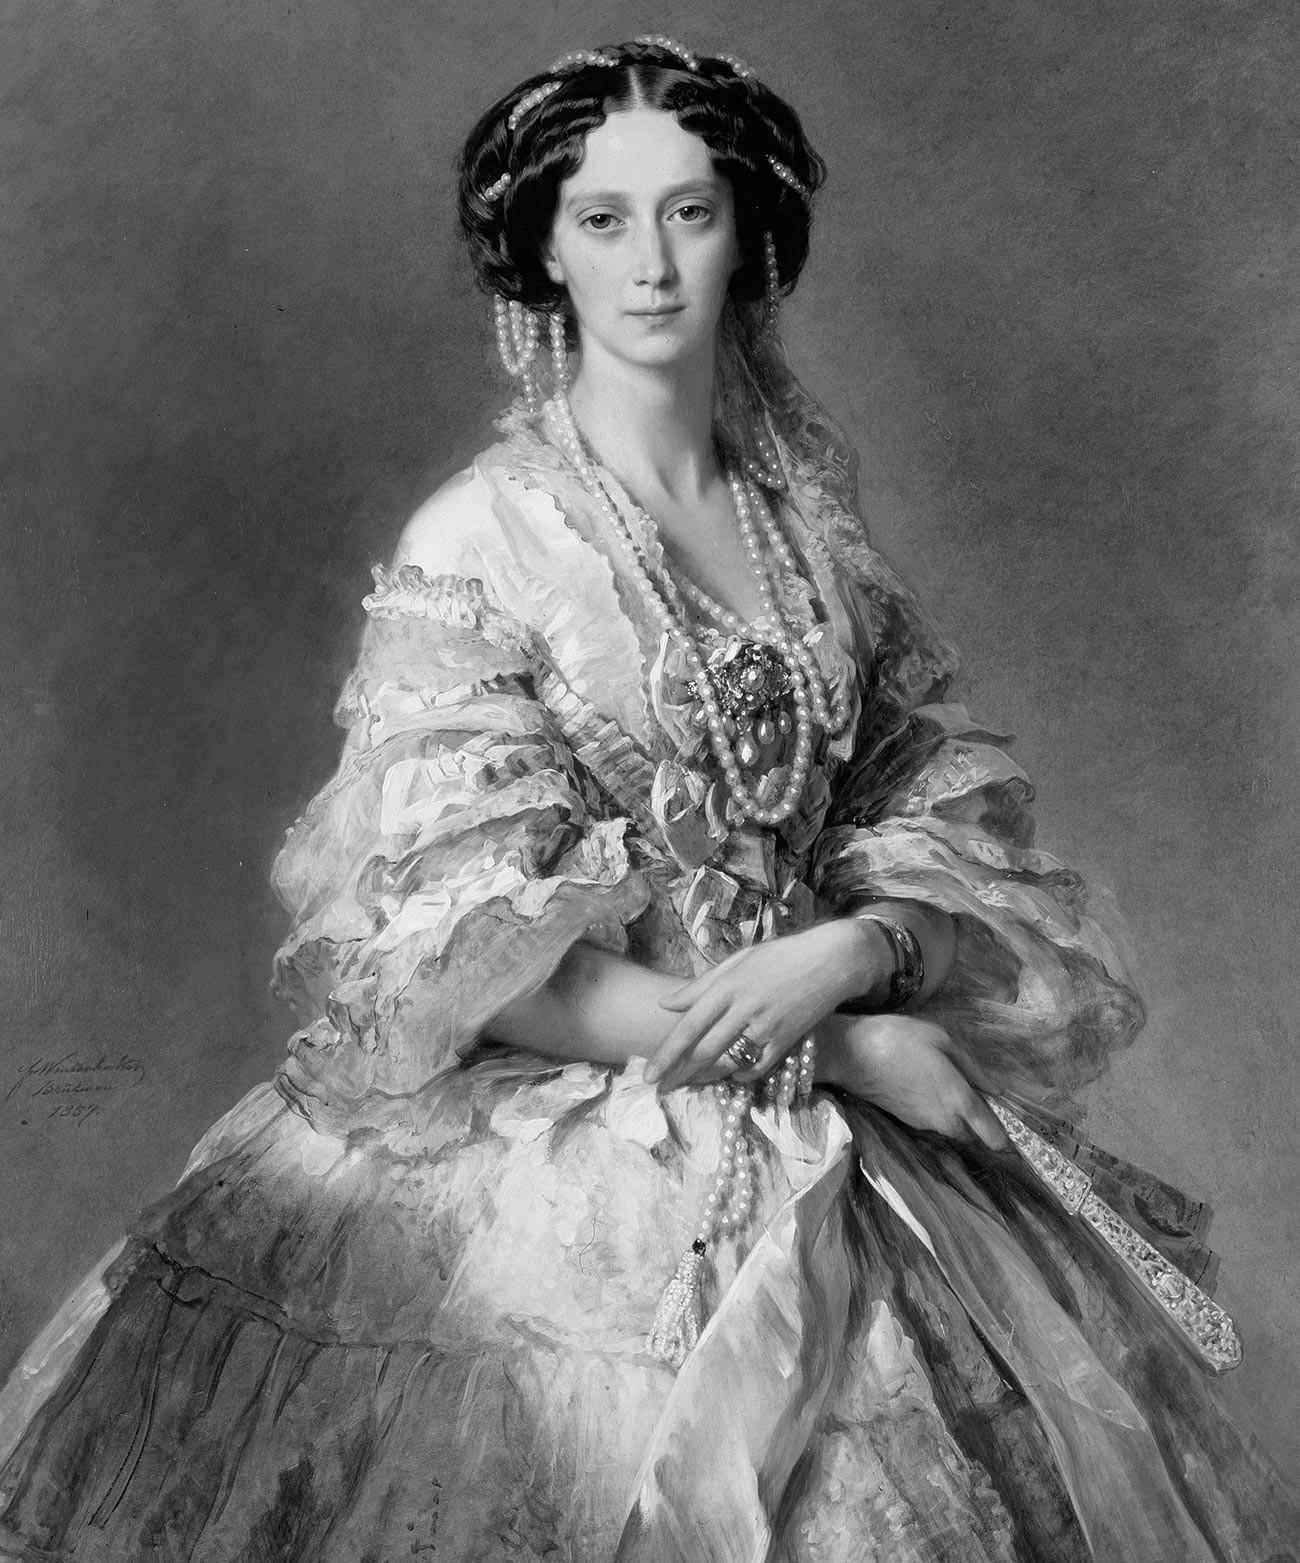 carica Marija Aleksandrovna